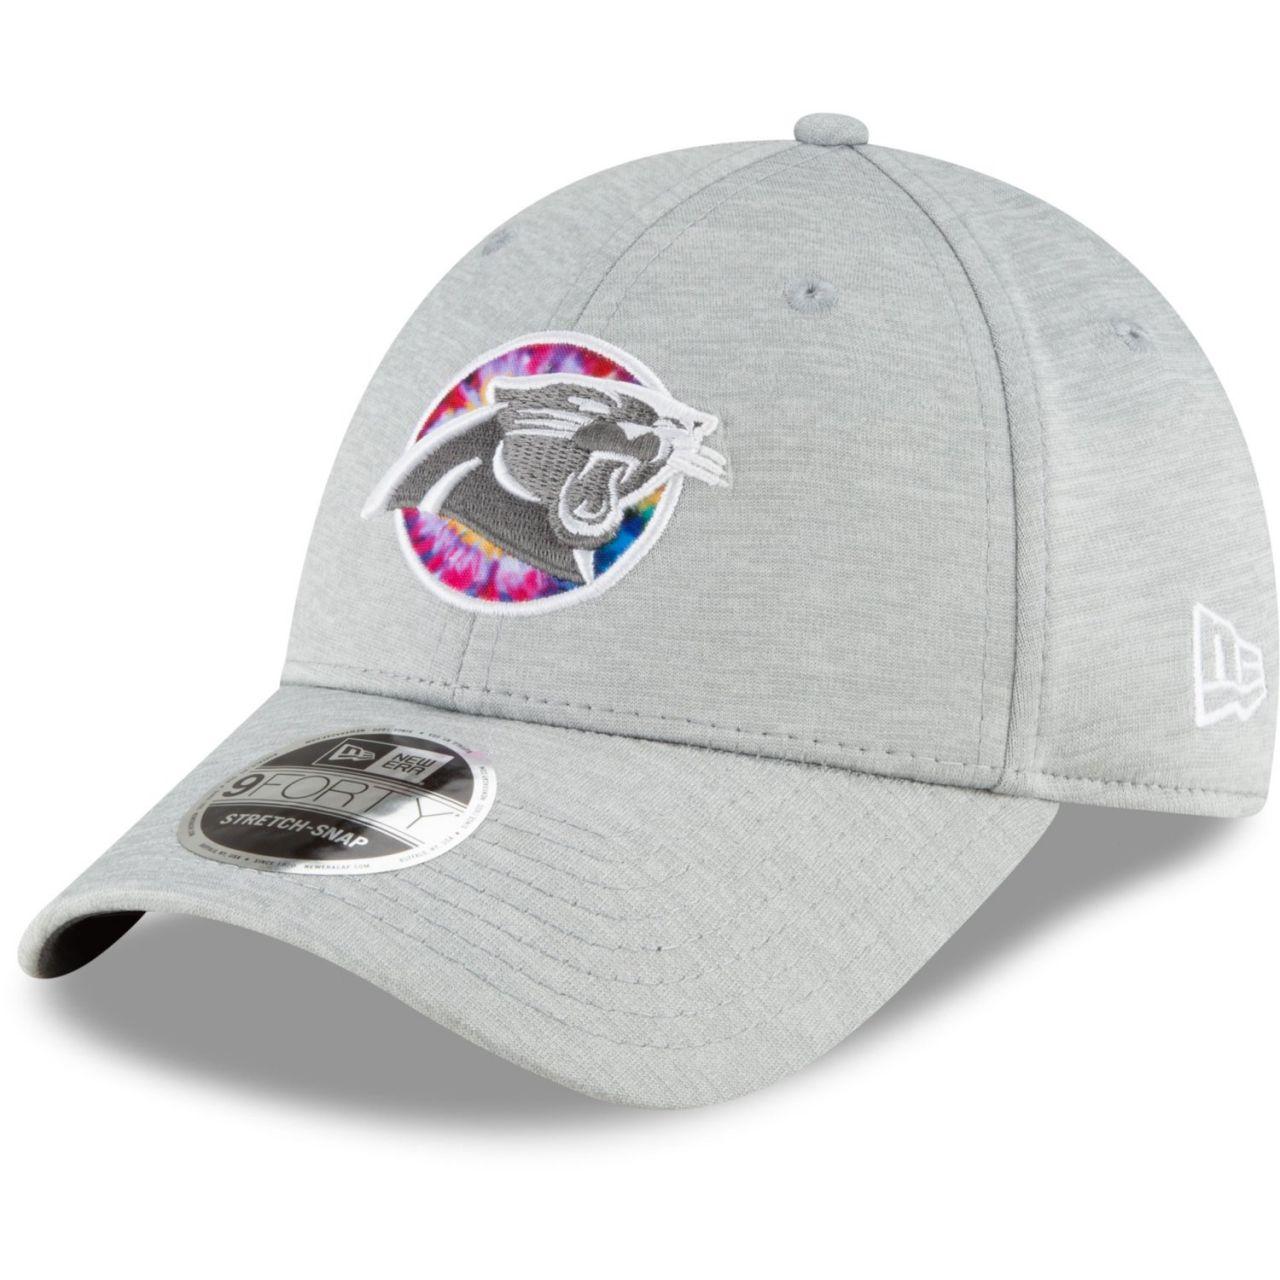 amfoo - New Era 9FORTY Stretch Cap - CRUCIAL CATCH Carolina Panthers